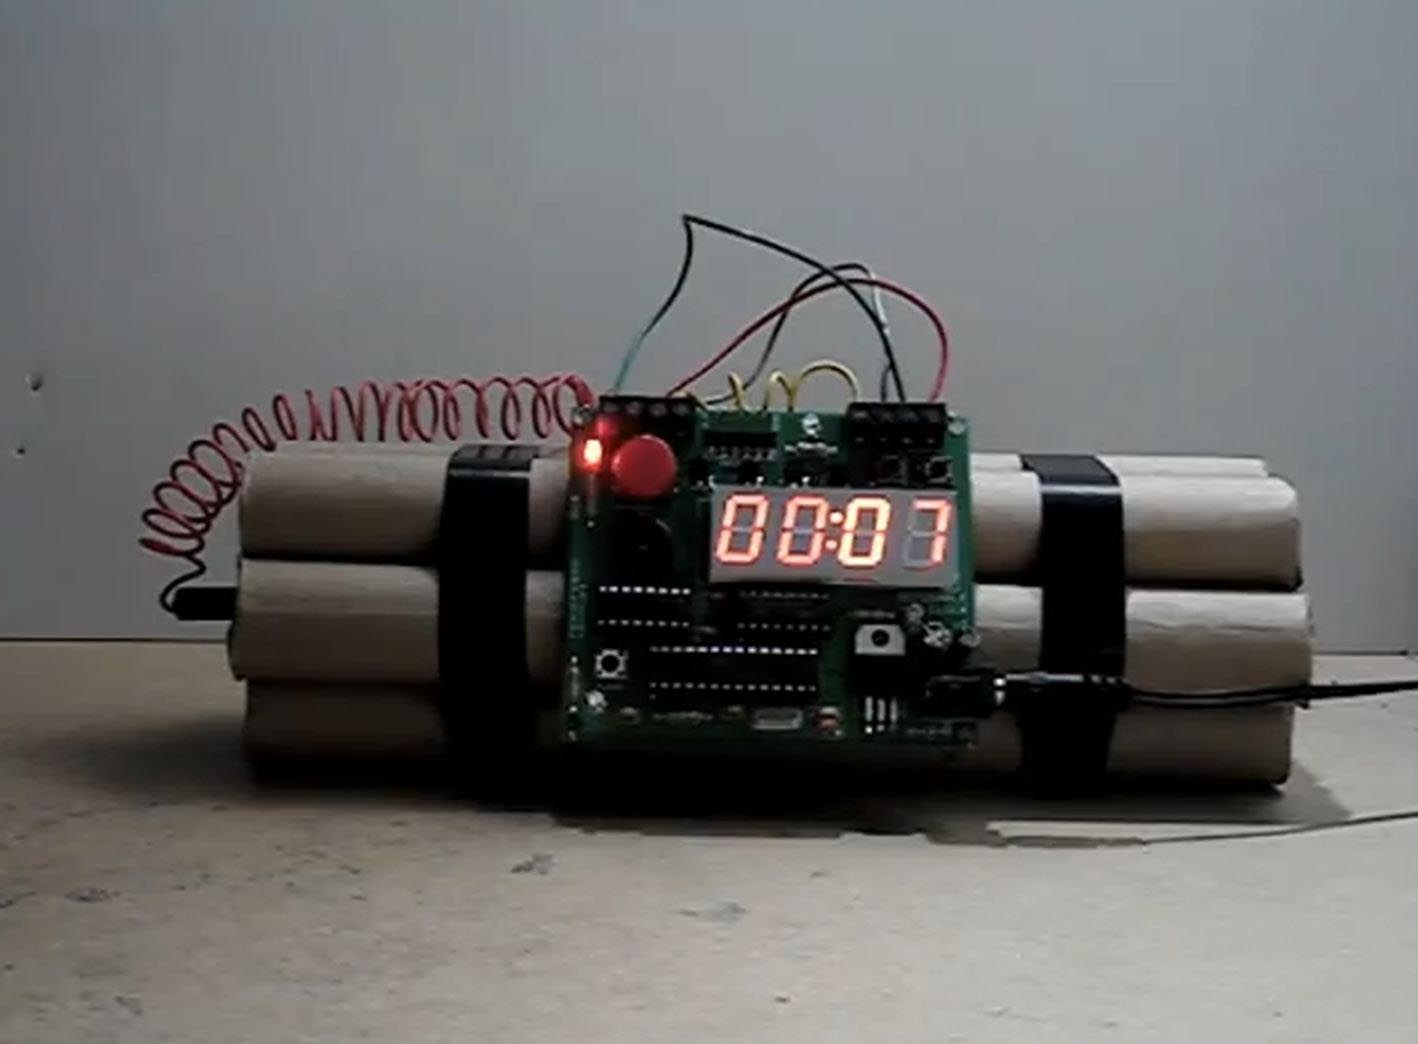 Cool Digital Alarm Clocks | Best Decor Things